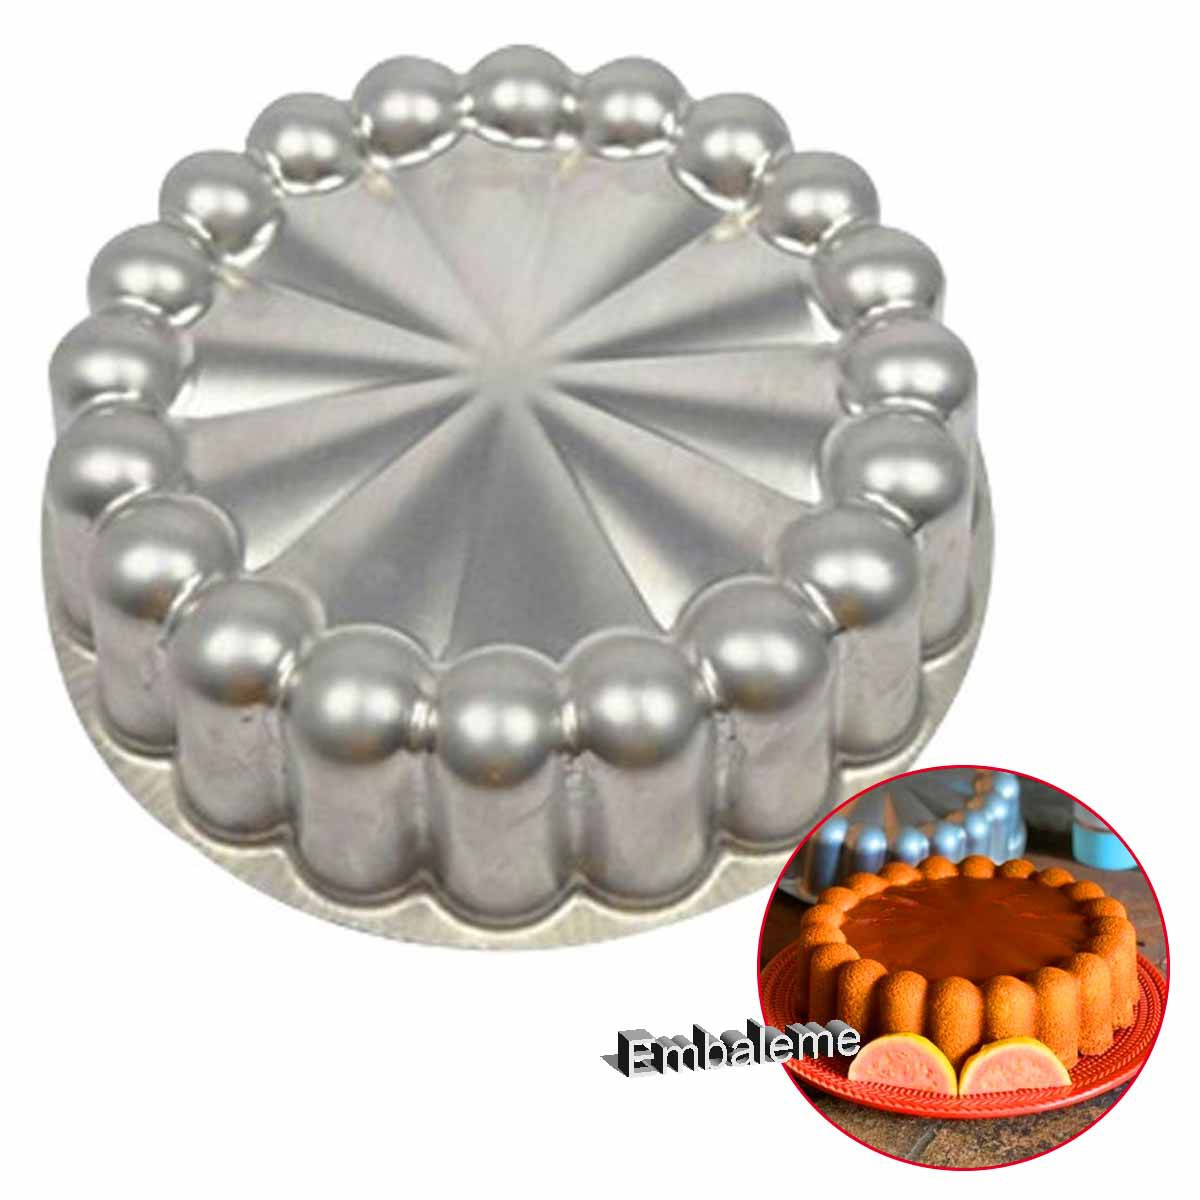 Forma Ballerine decorada alumínio 22x6cm (0796) CAPARROZ